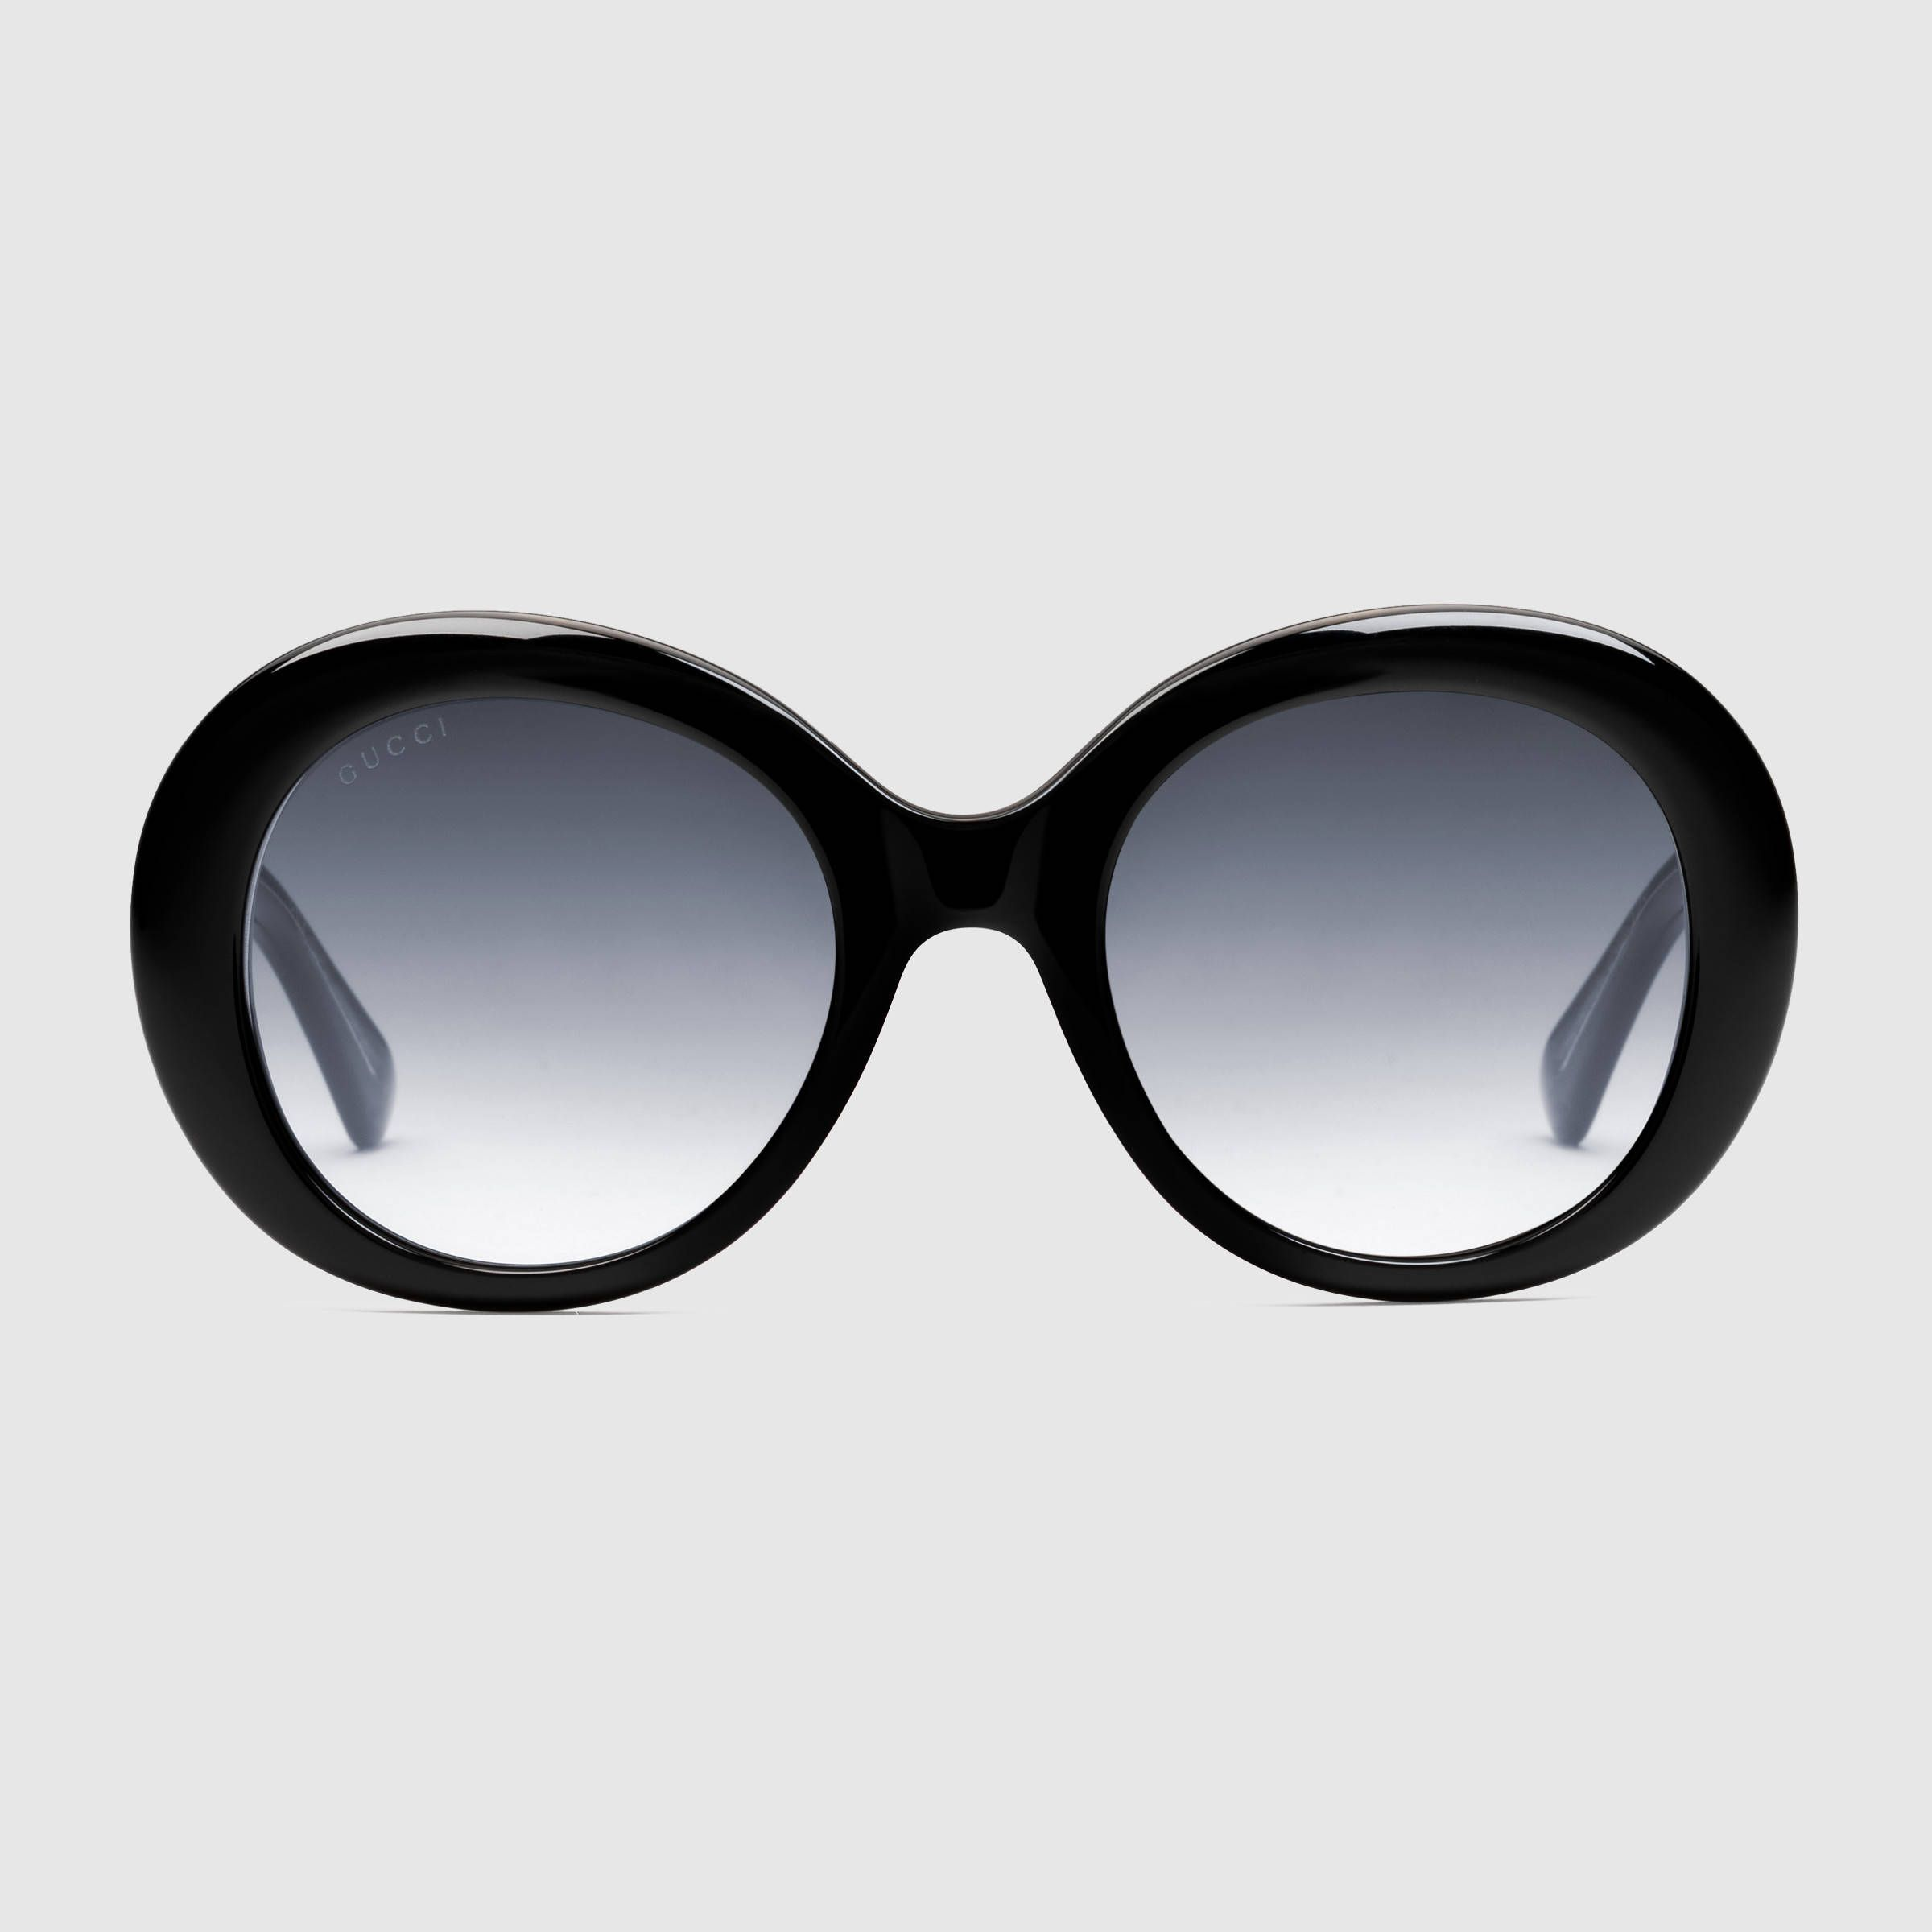 Gucci Women - Oval-frame acetate sunglasses - 434076J07701011 ...